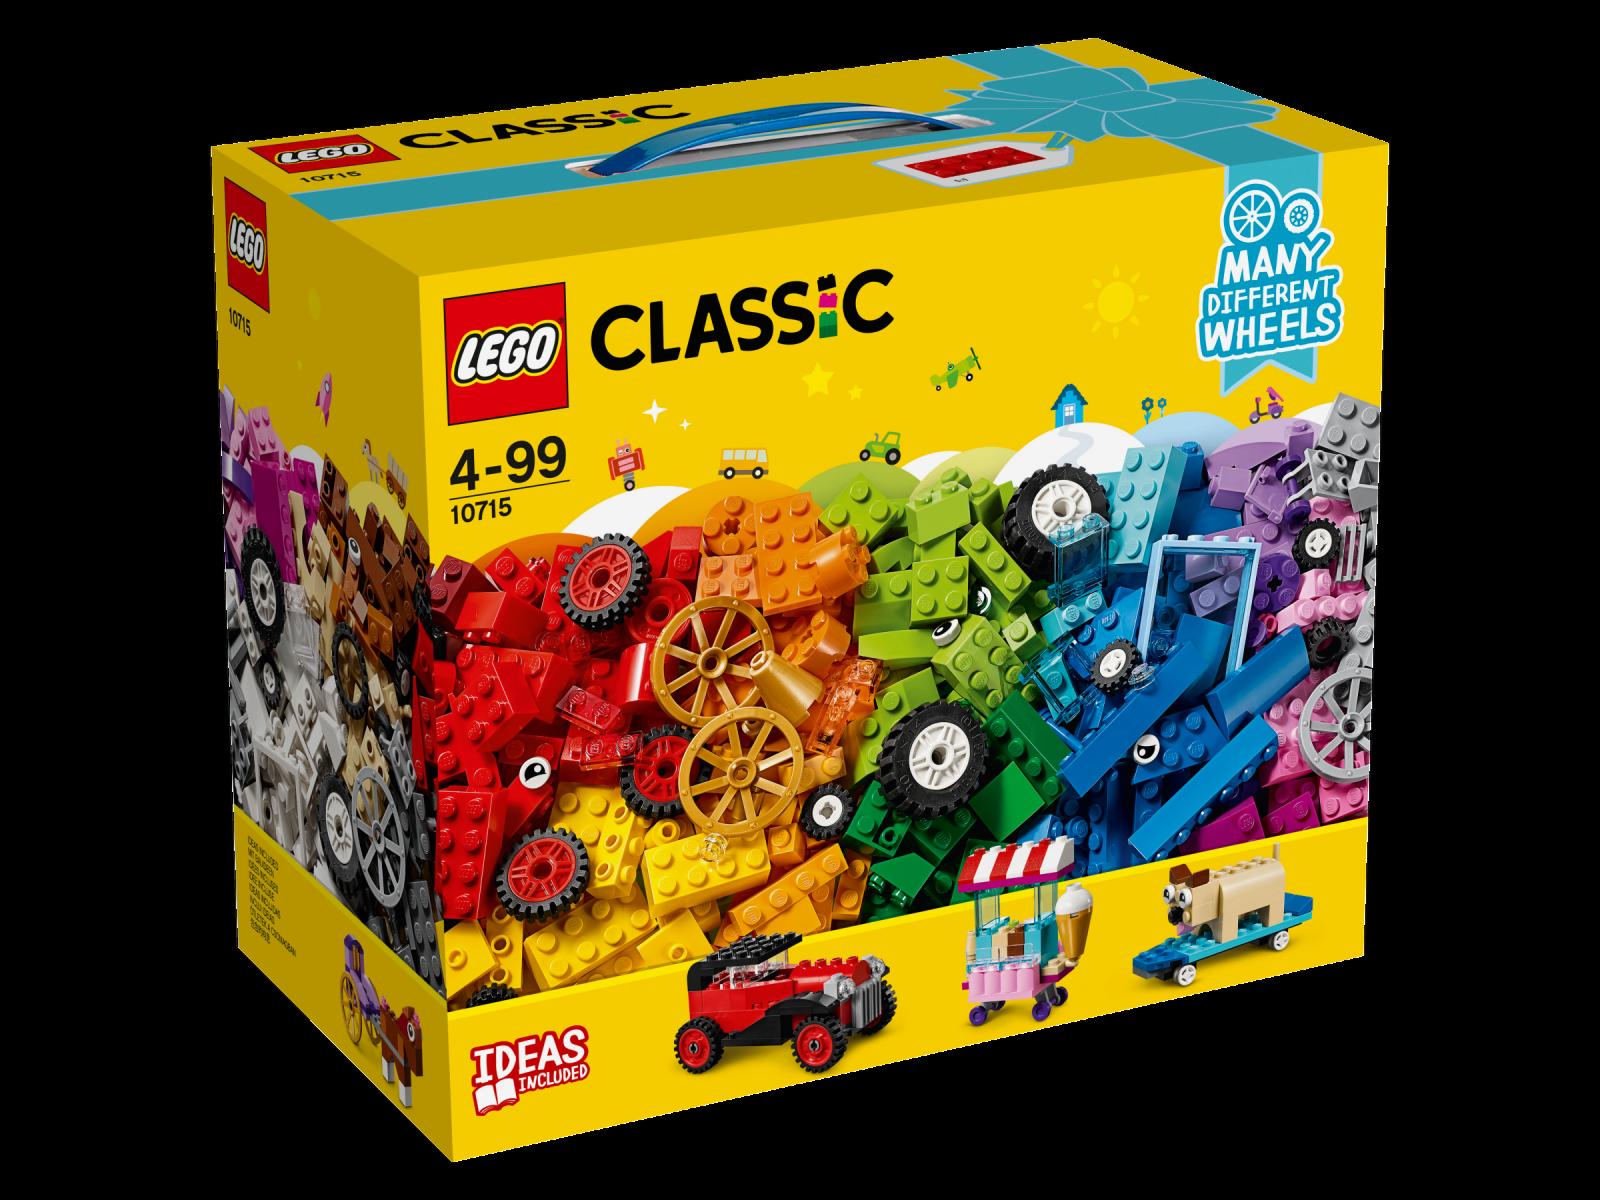 Classic ® Bauset Créatif Lego 10715 2DYEeWH9I